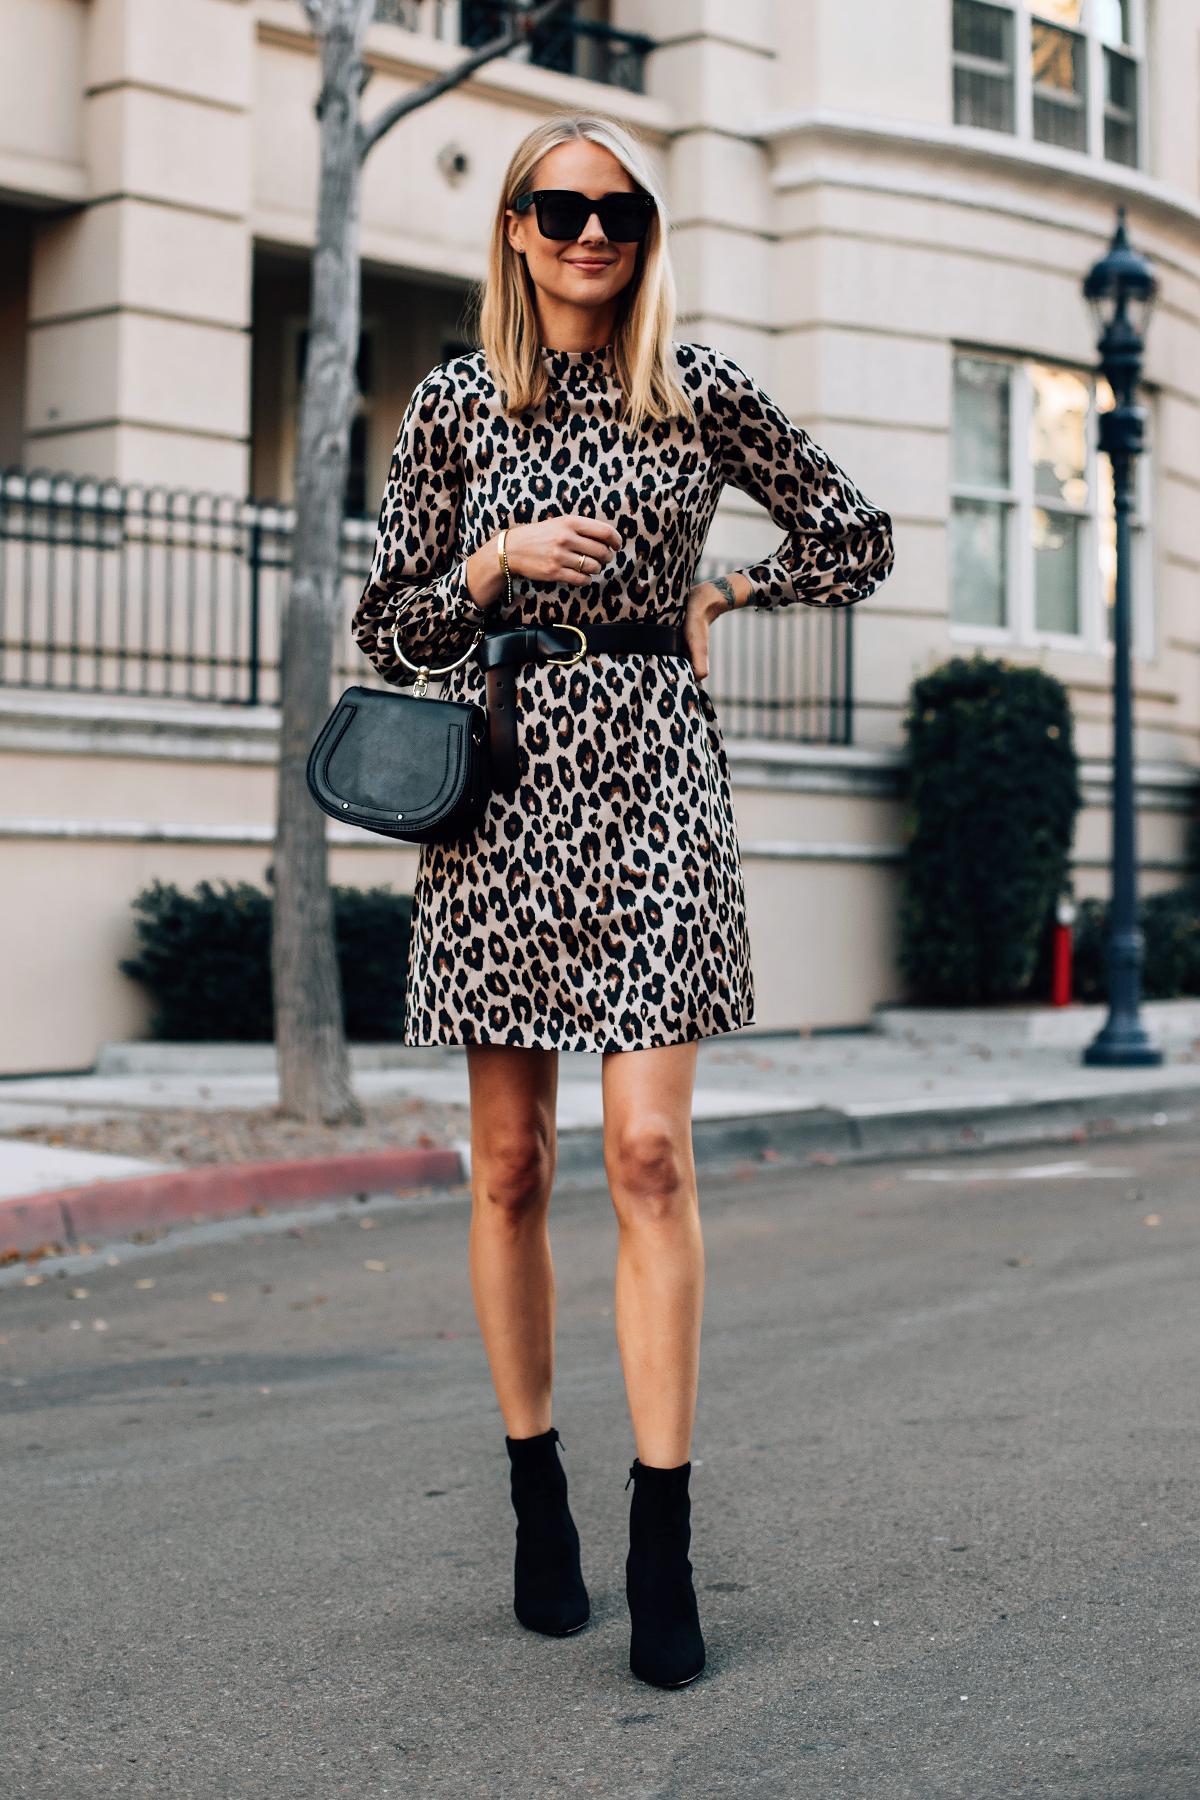 Blonde Woman Wearing Ann Taylor Leopard Dress Black Wrap Belt Black Ankle Booties Fashion jackson San Diego Fashion Blogger Street Style